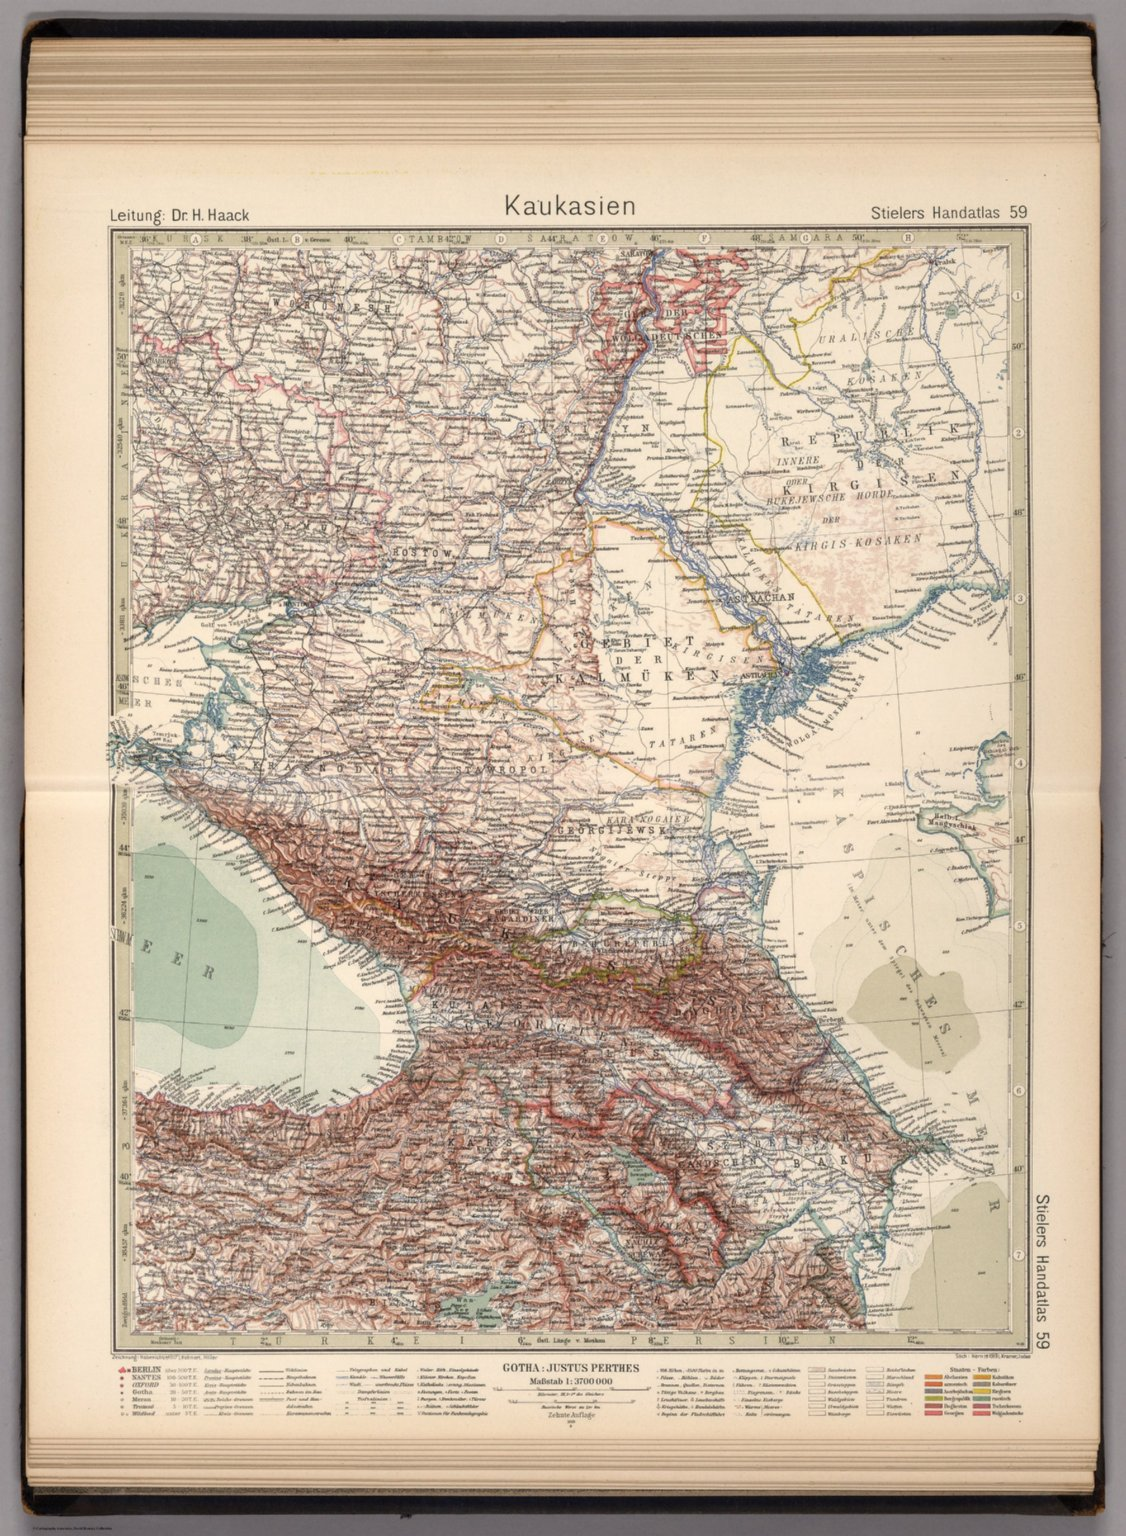 59. Kaukasien. Caucasia.